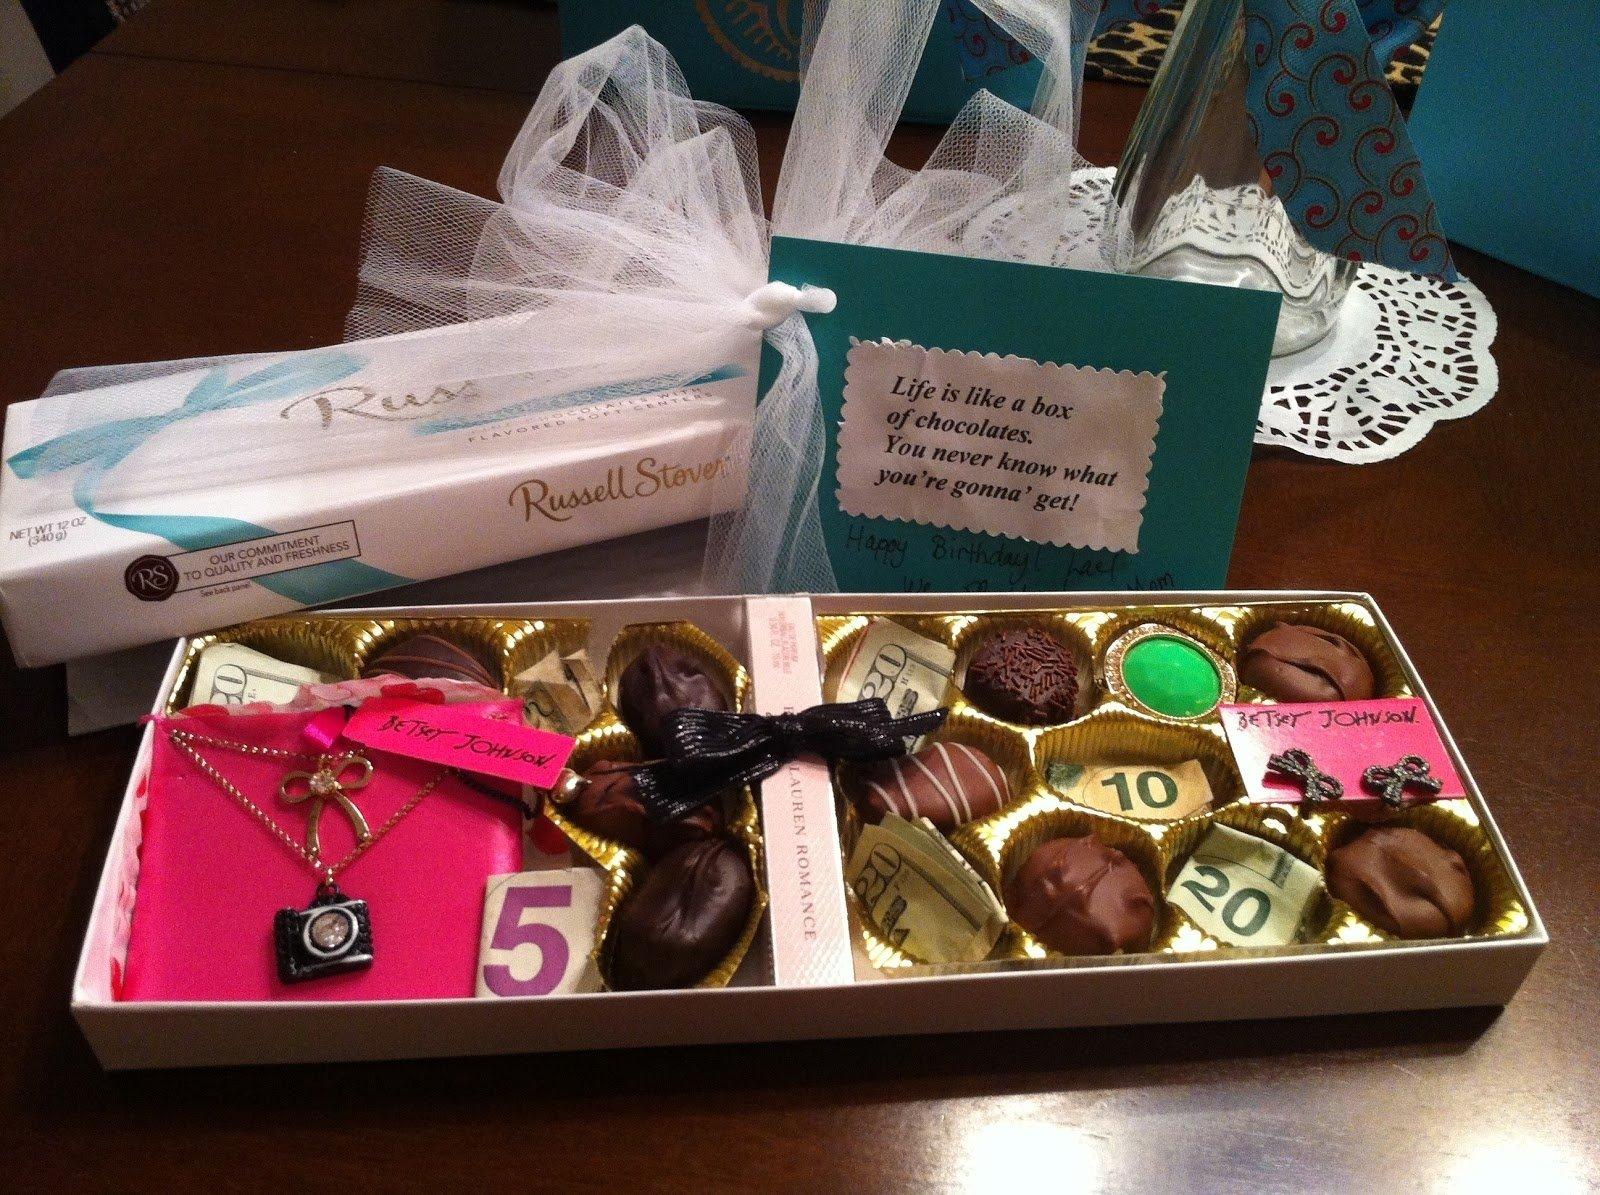 10 Awesome Gift Ideas For Boyfriend Birthday gift ideas for boyfriend gift ideas for boyfriend birthday 26 1 2020